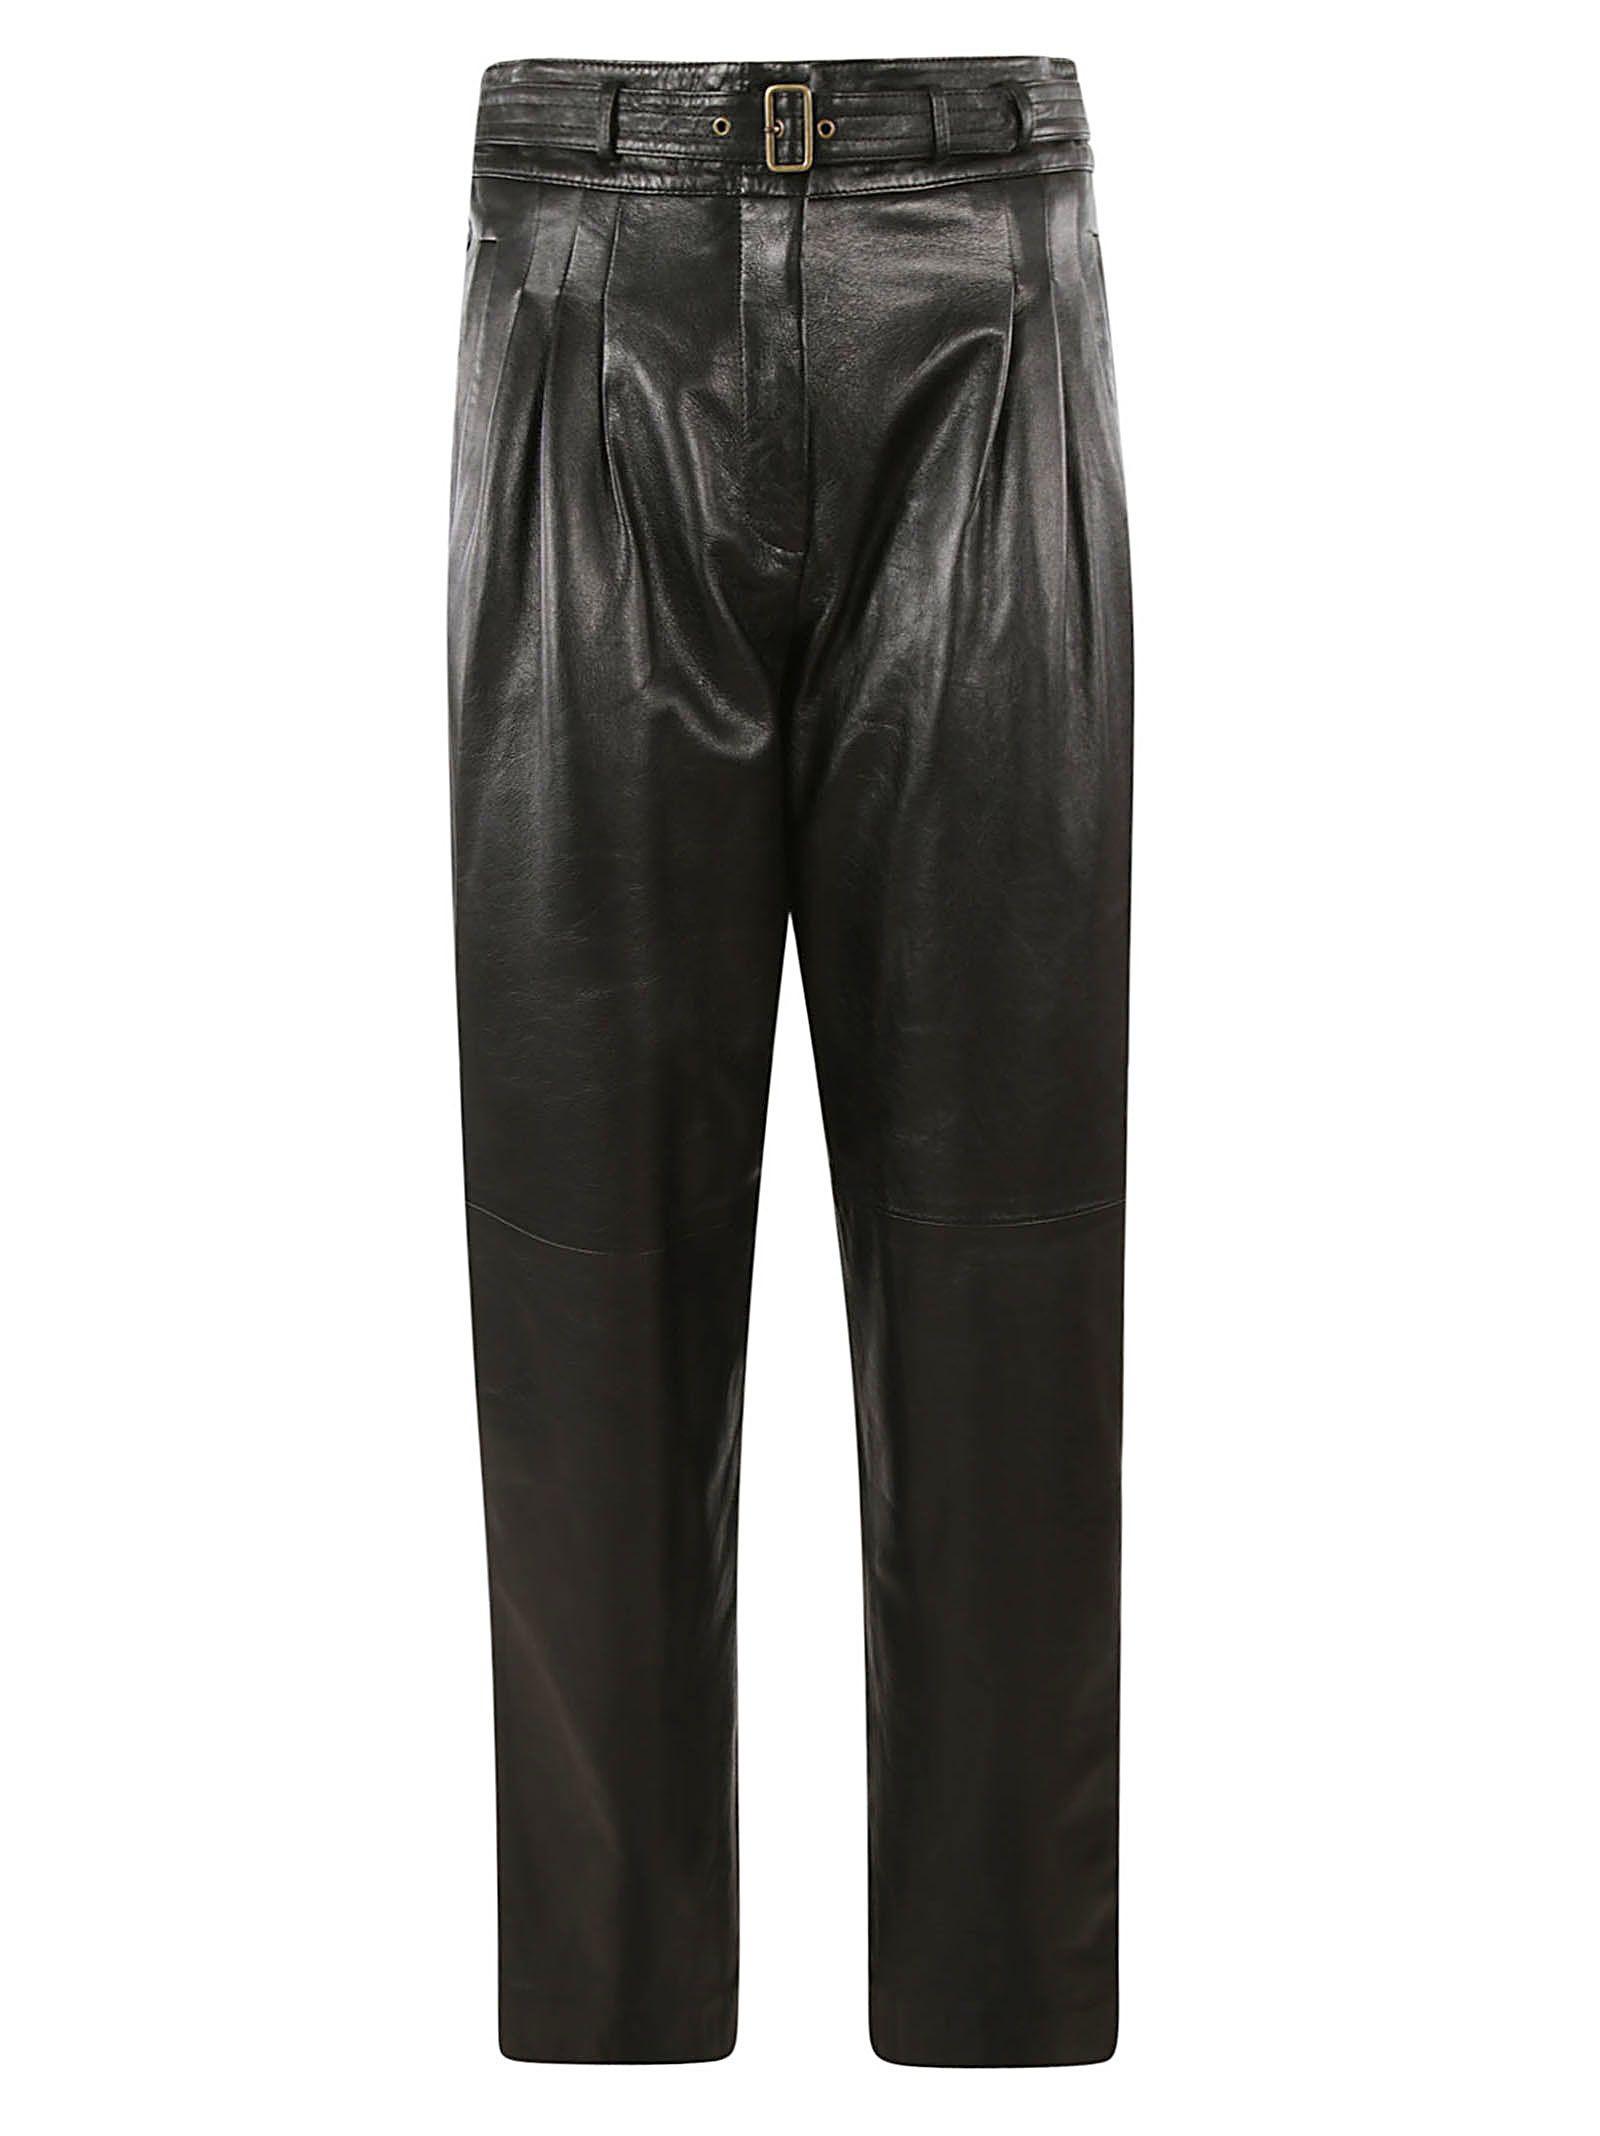 Alberta Ferretti Belted Glossy Trousers